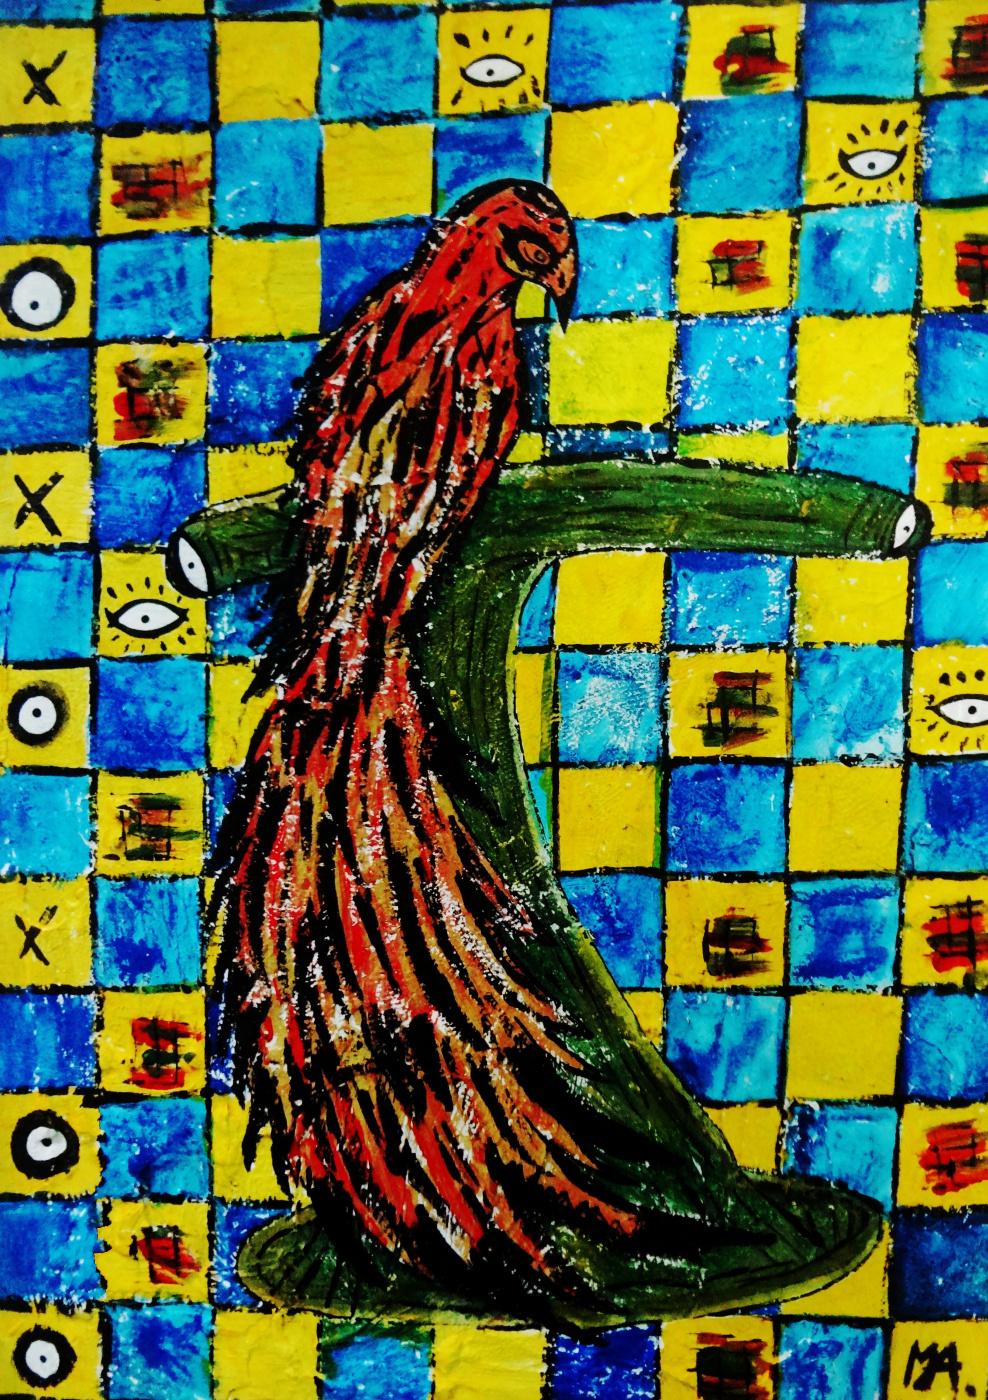 Mairon almeida. Bird on the pedestal